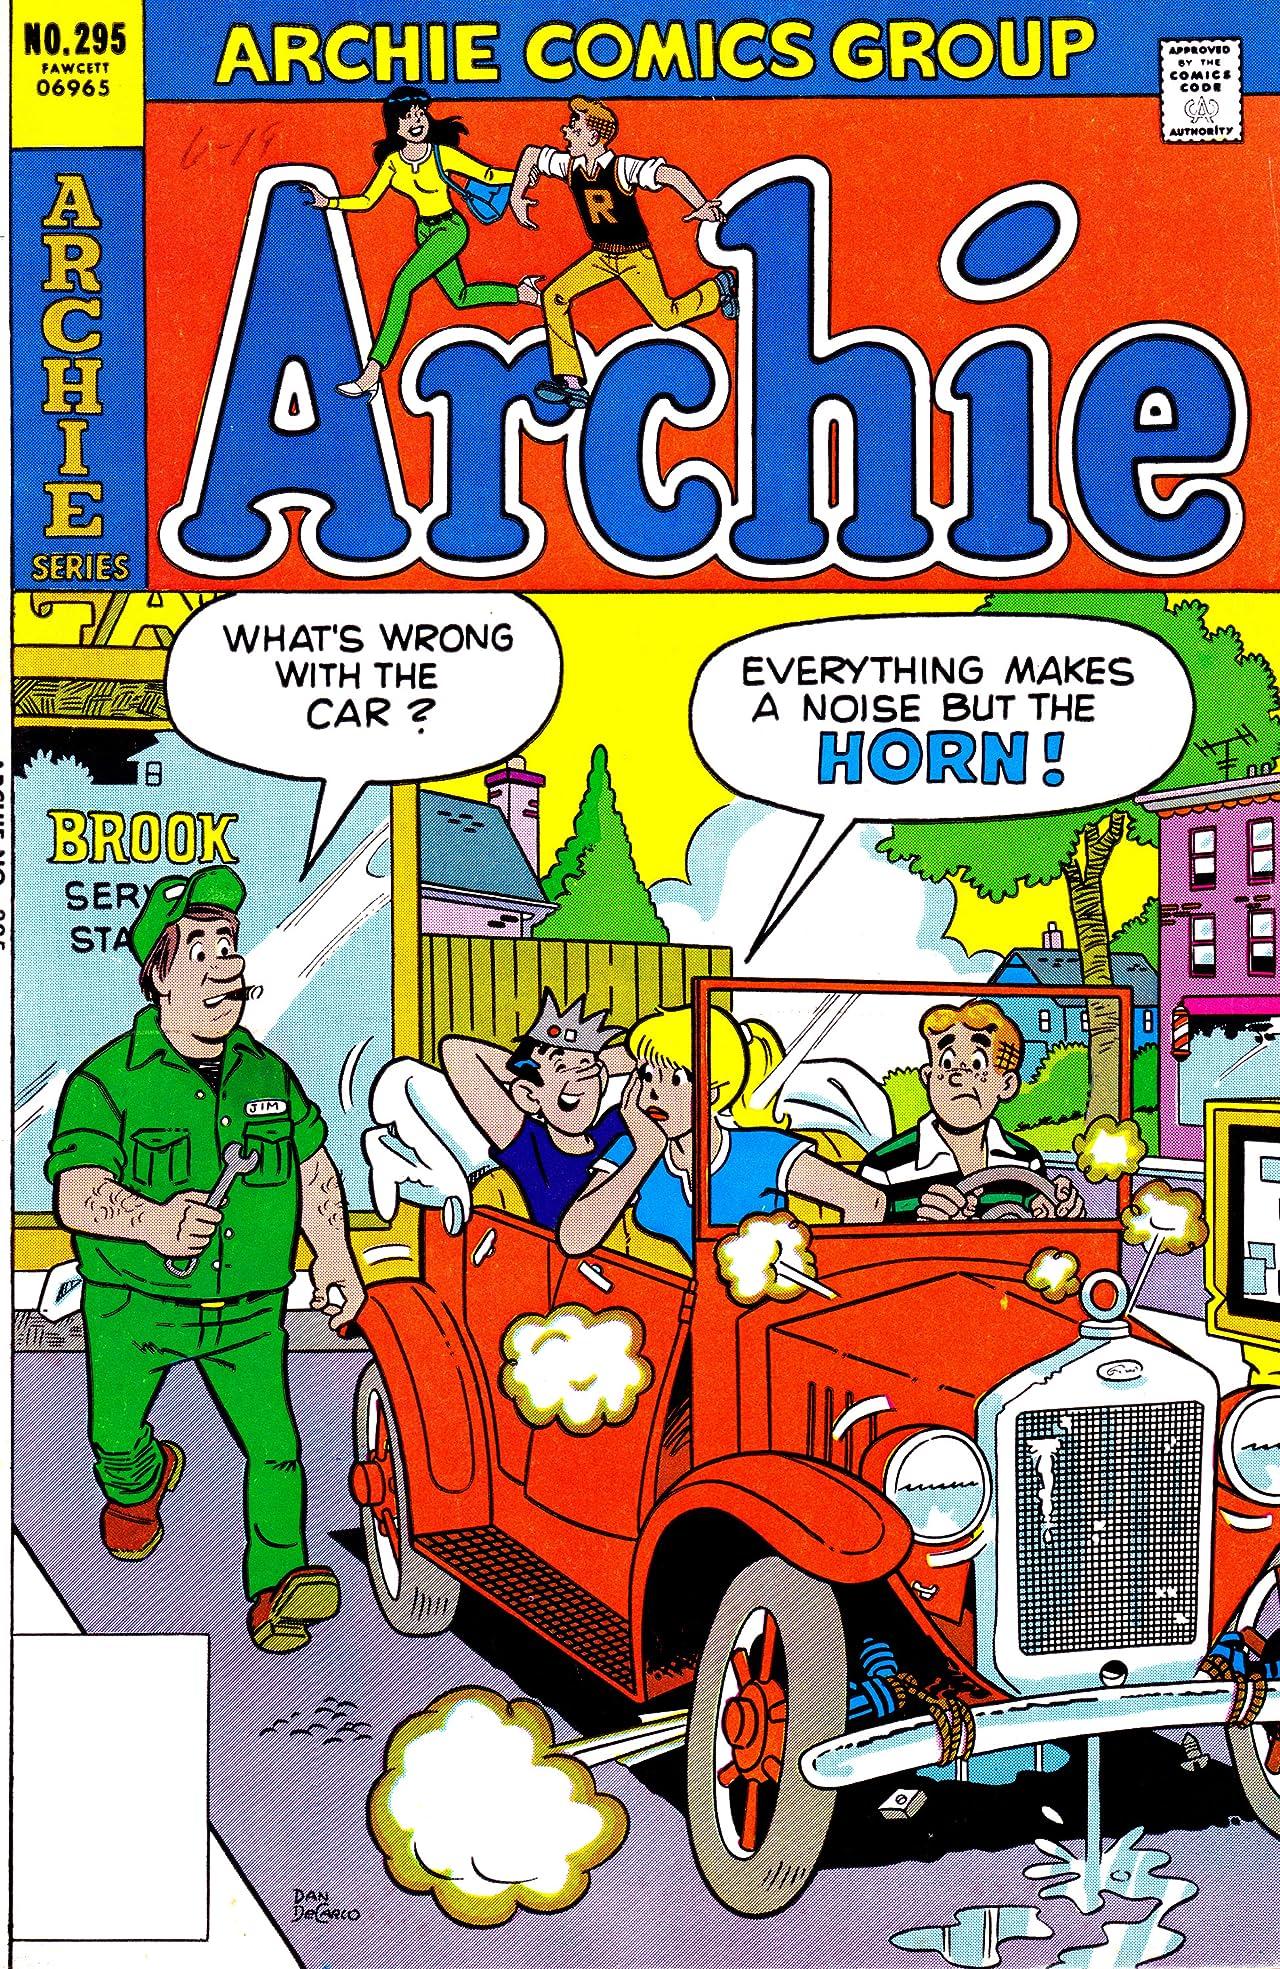 Archie #295